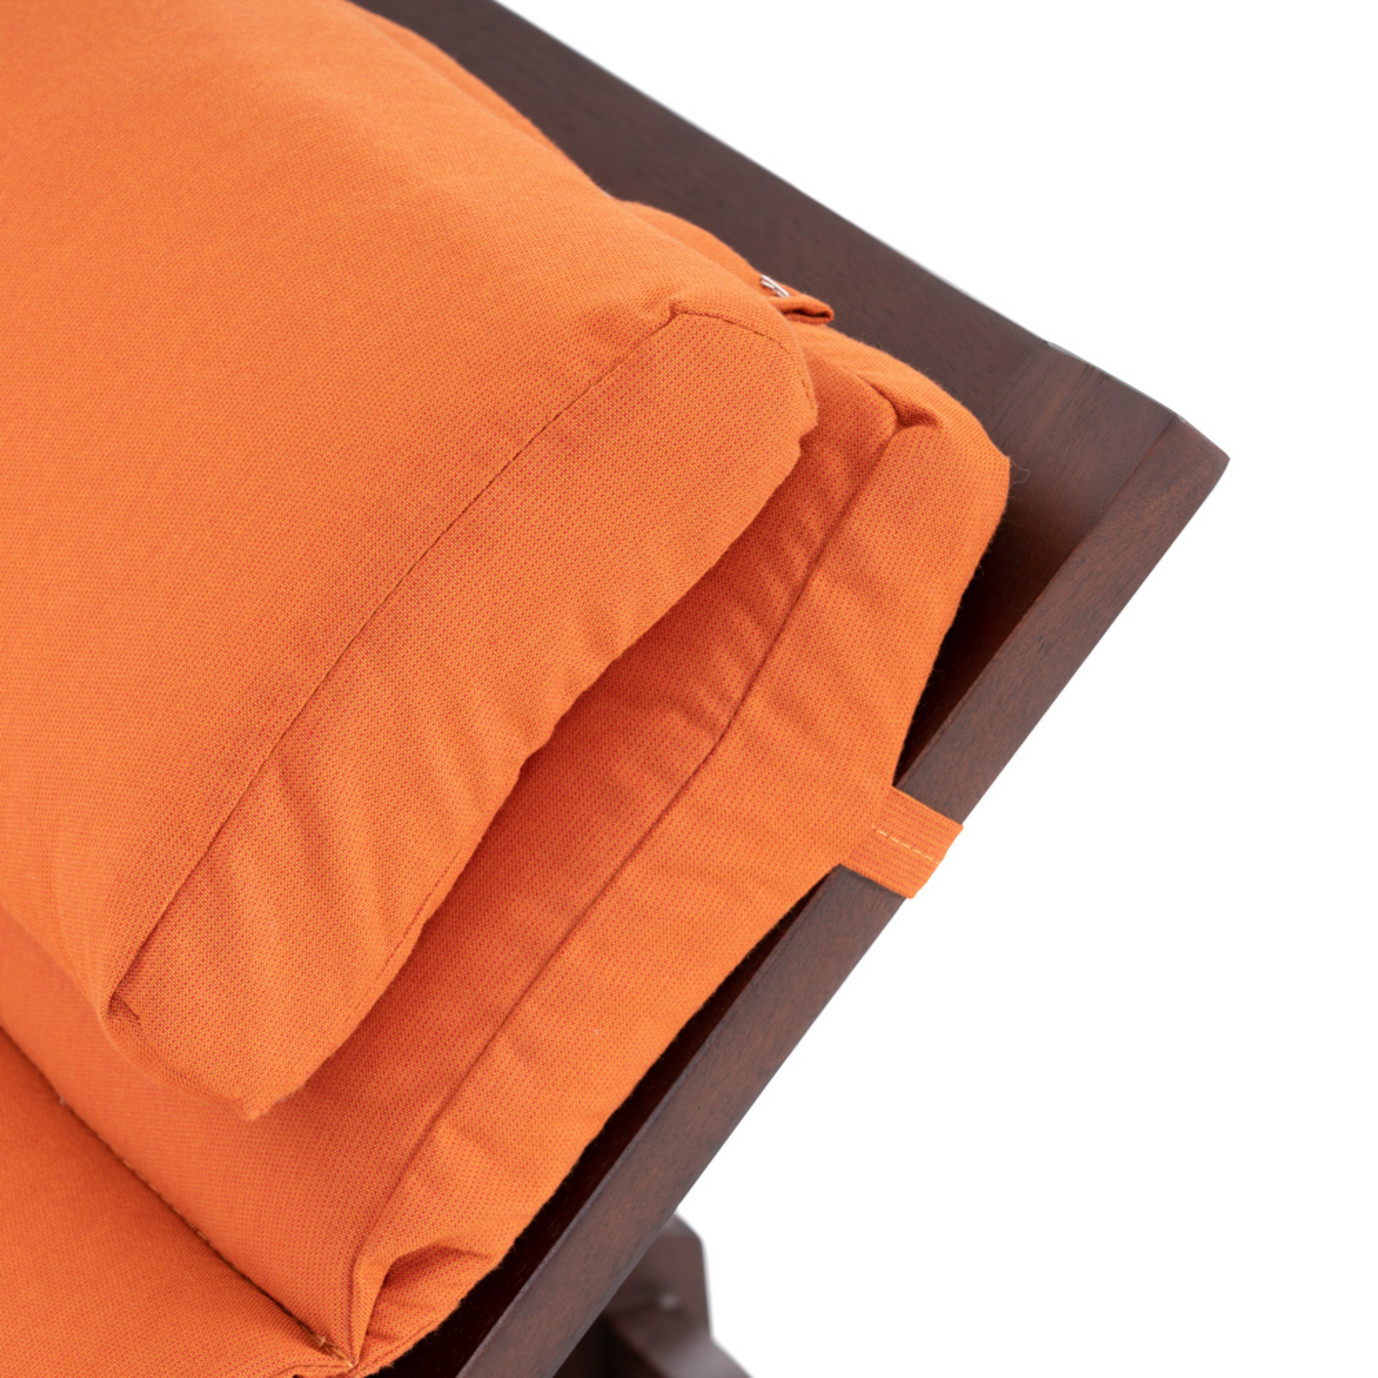 Vaughn Chaise Lounges - Tikka Orange